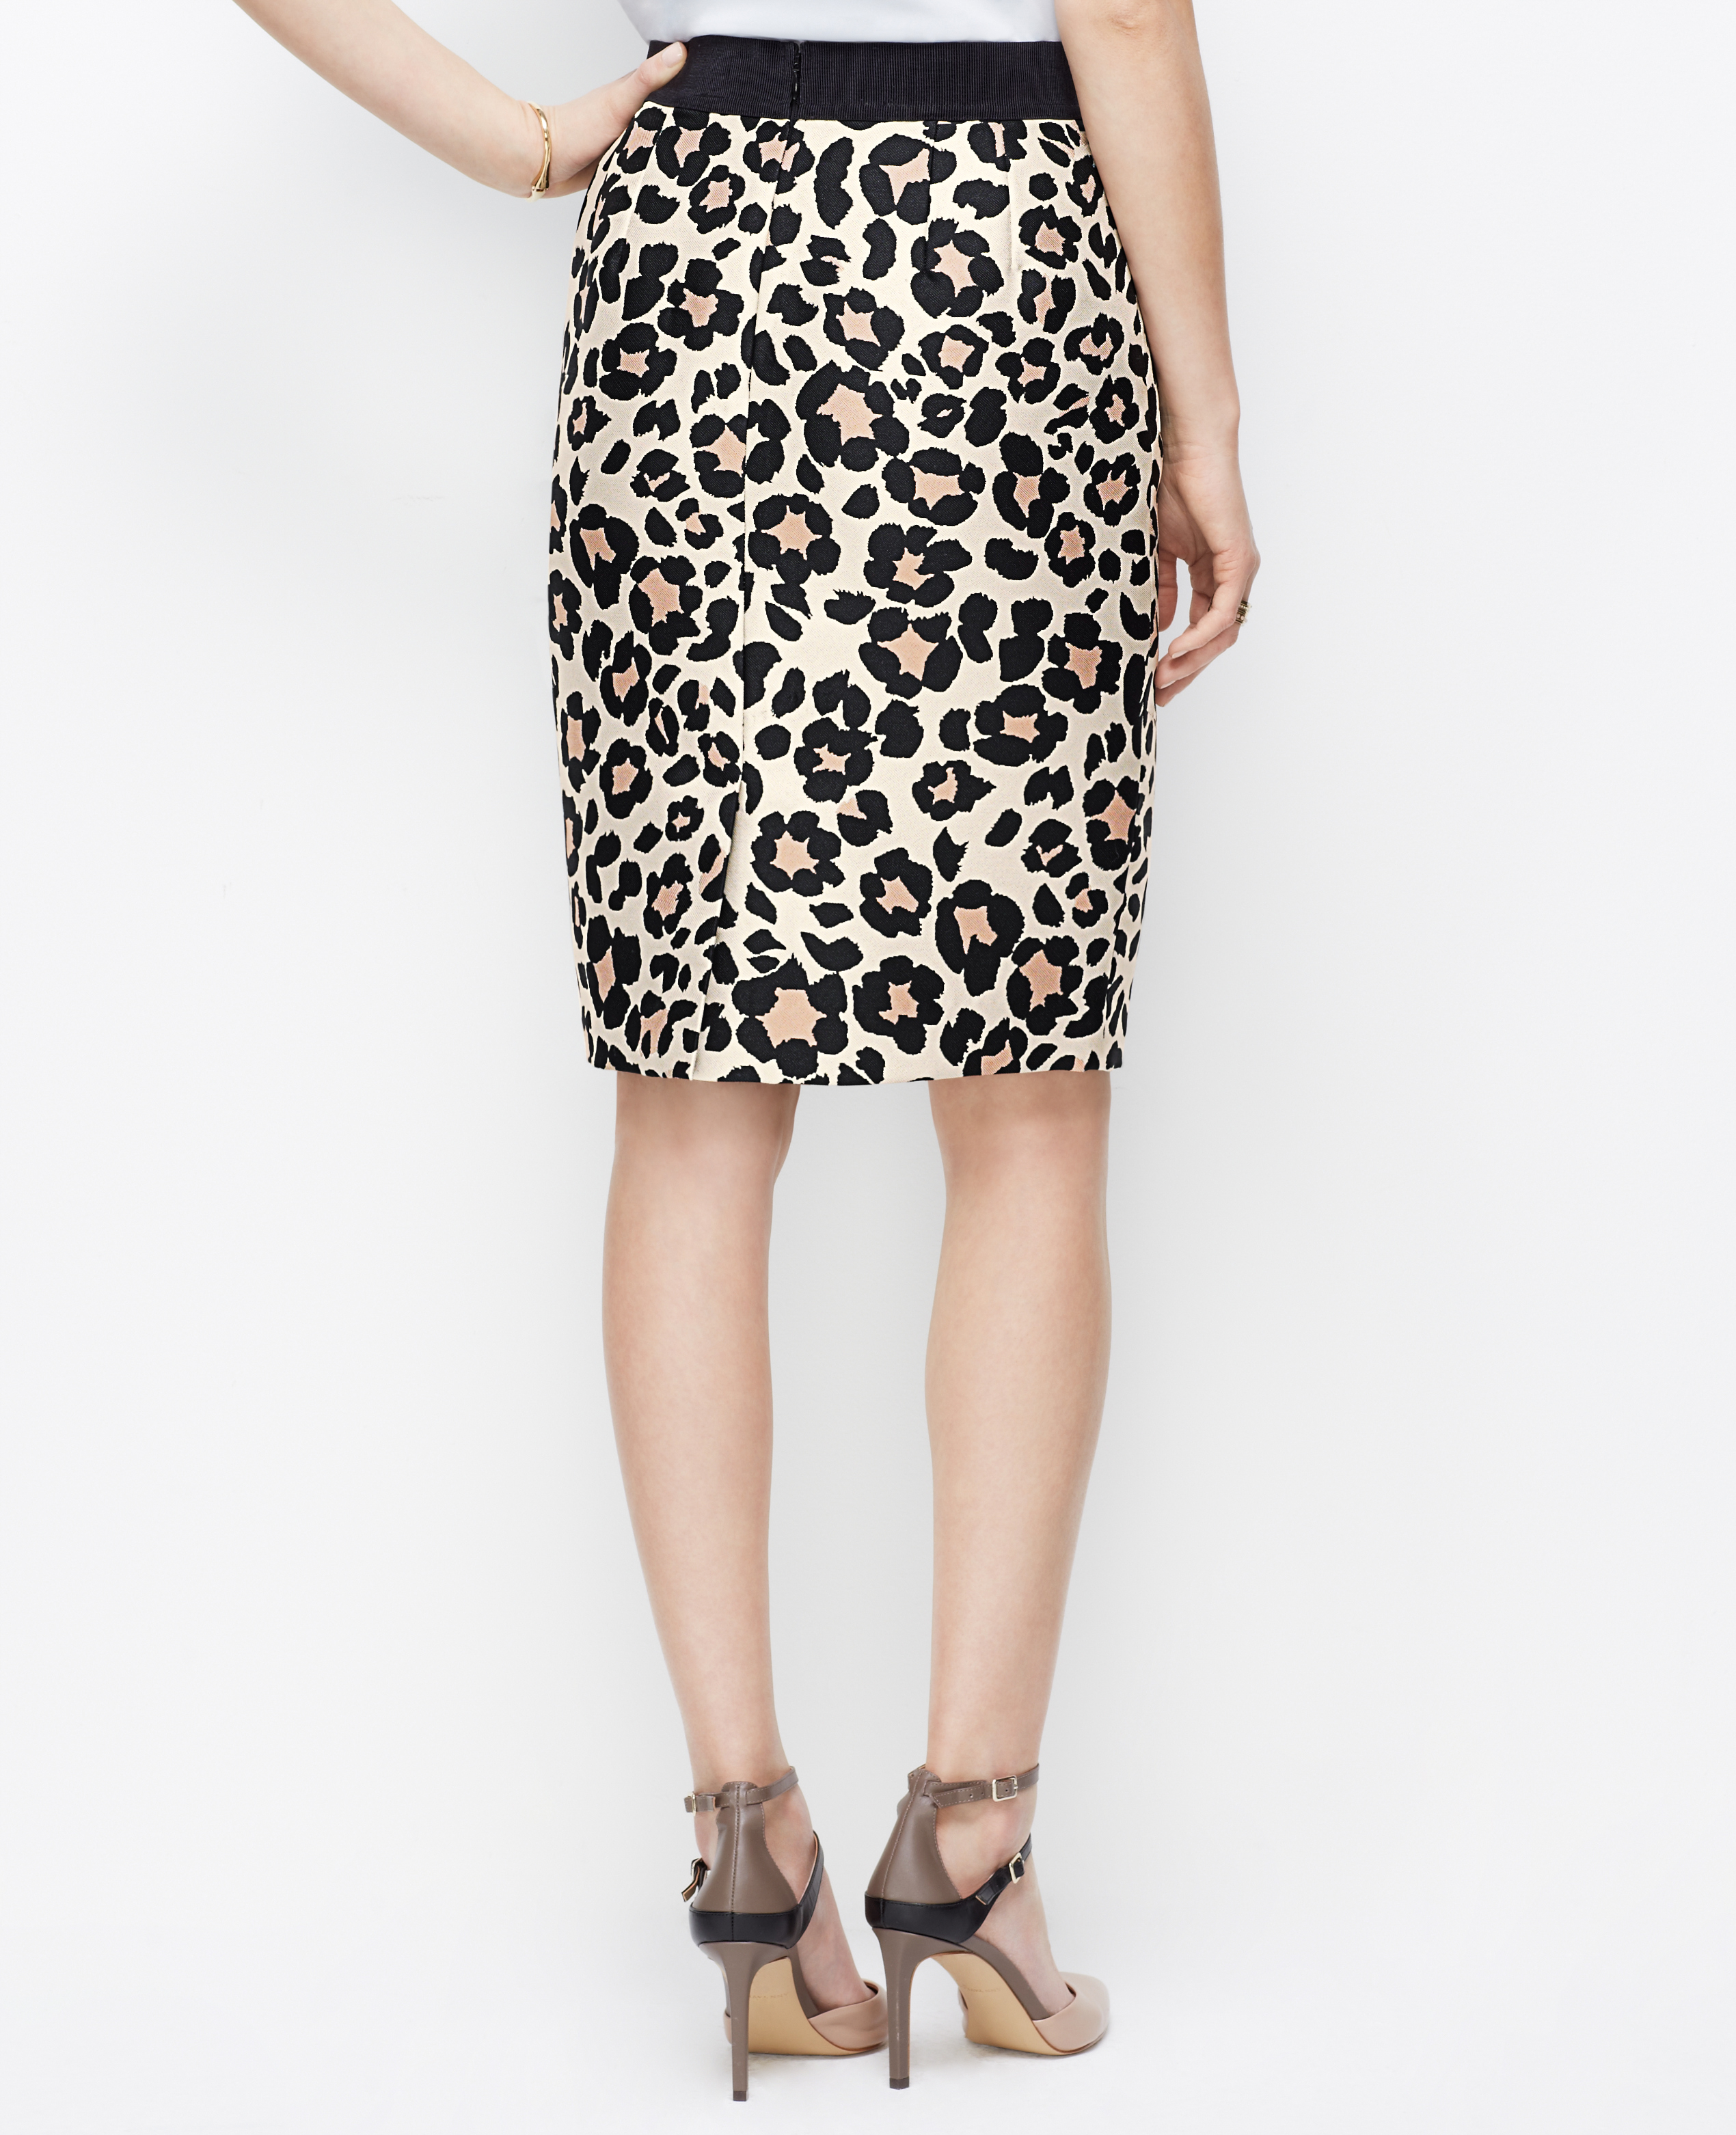 Ann Taylor Spring Leopard Pencil Skirt Lyst